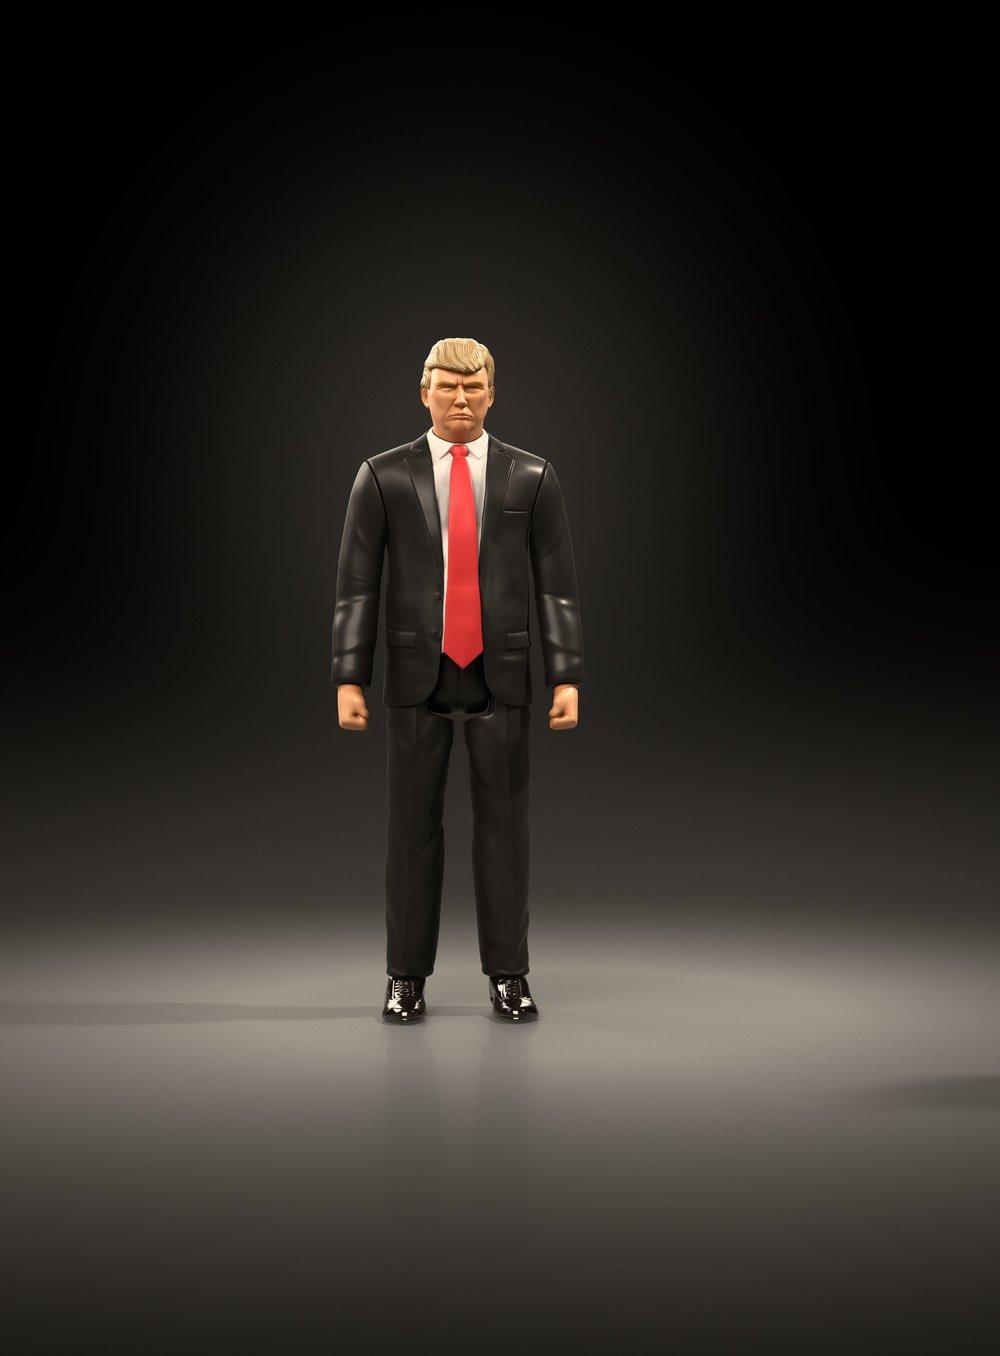 TrumpC_1.jpg